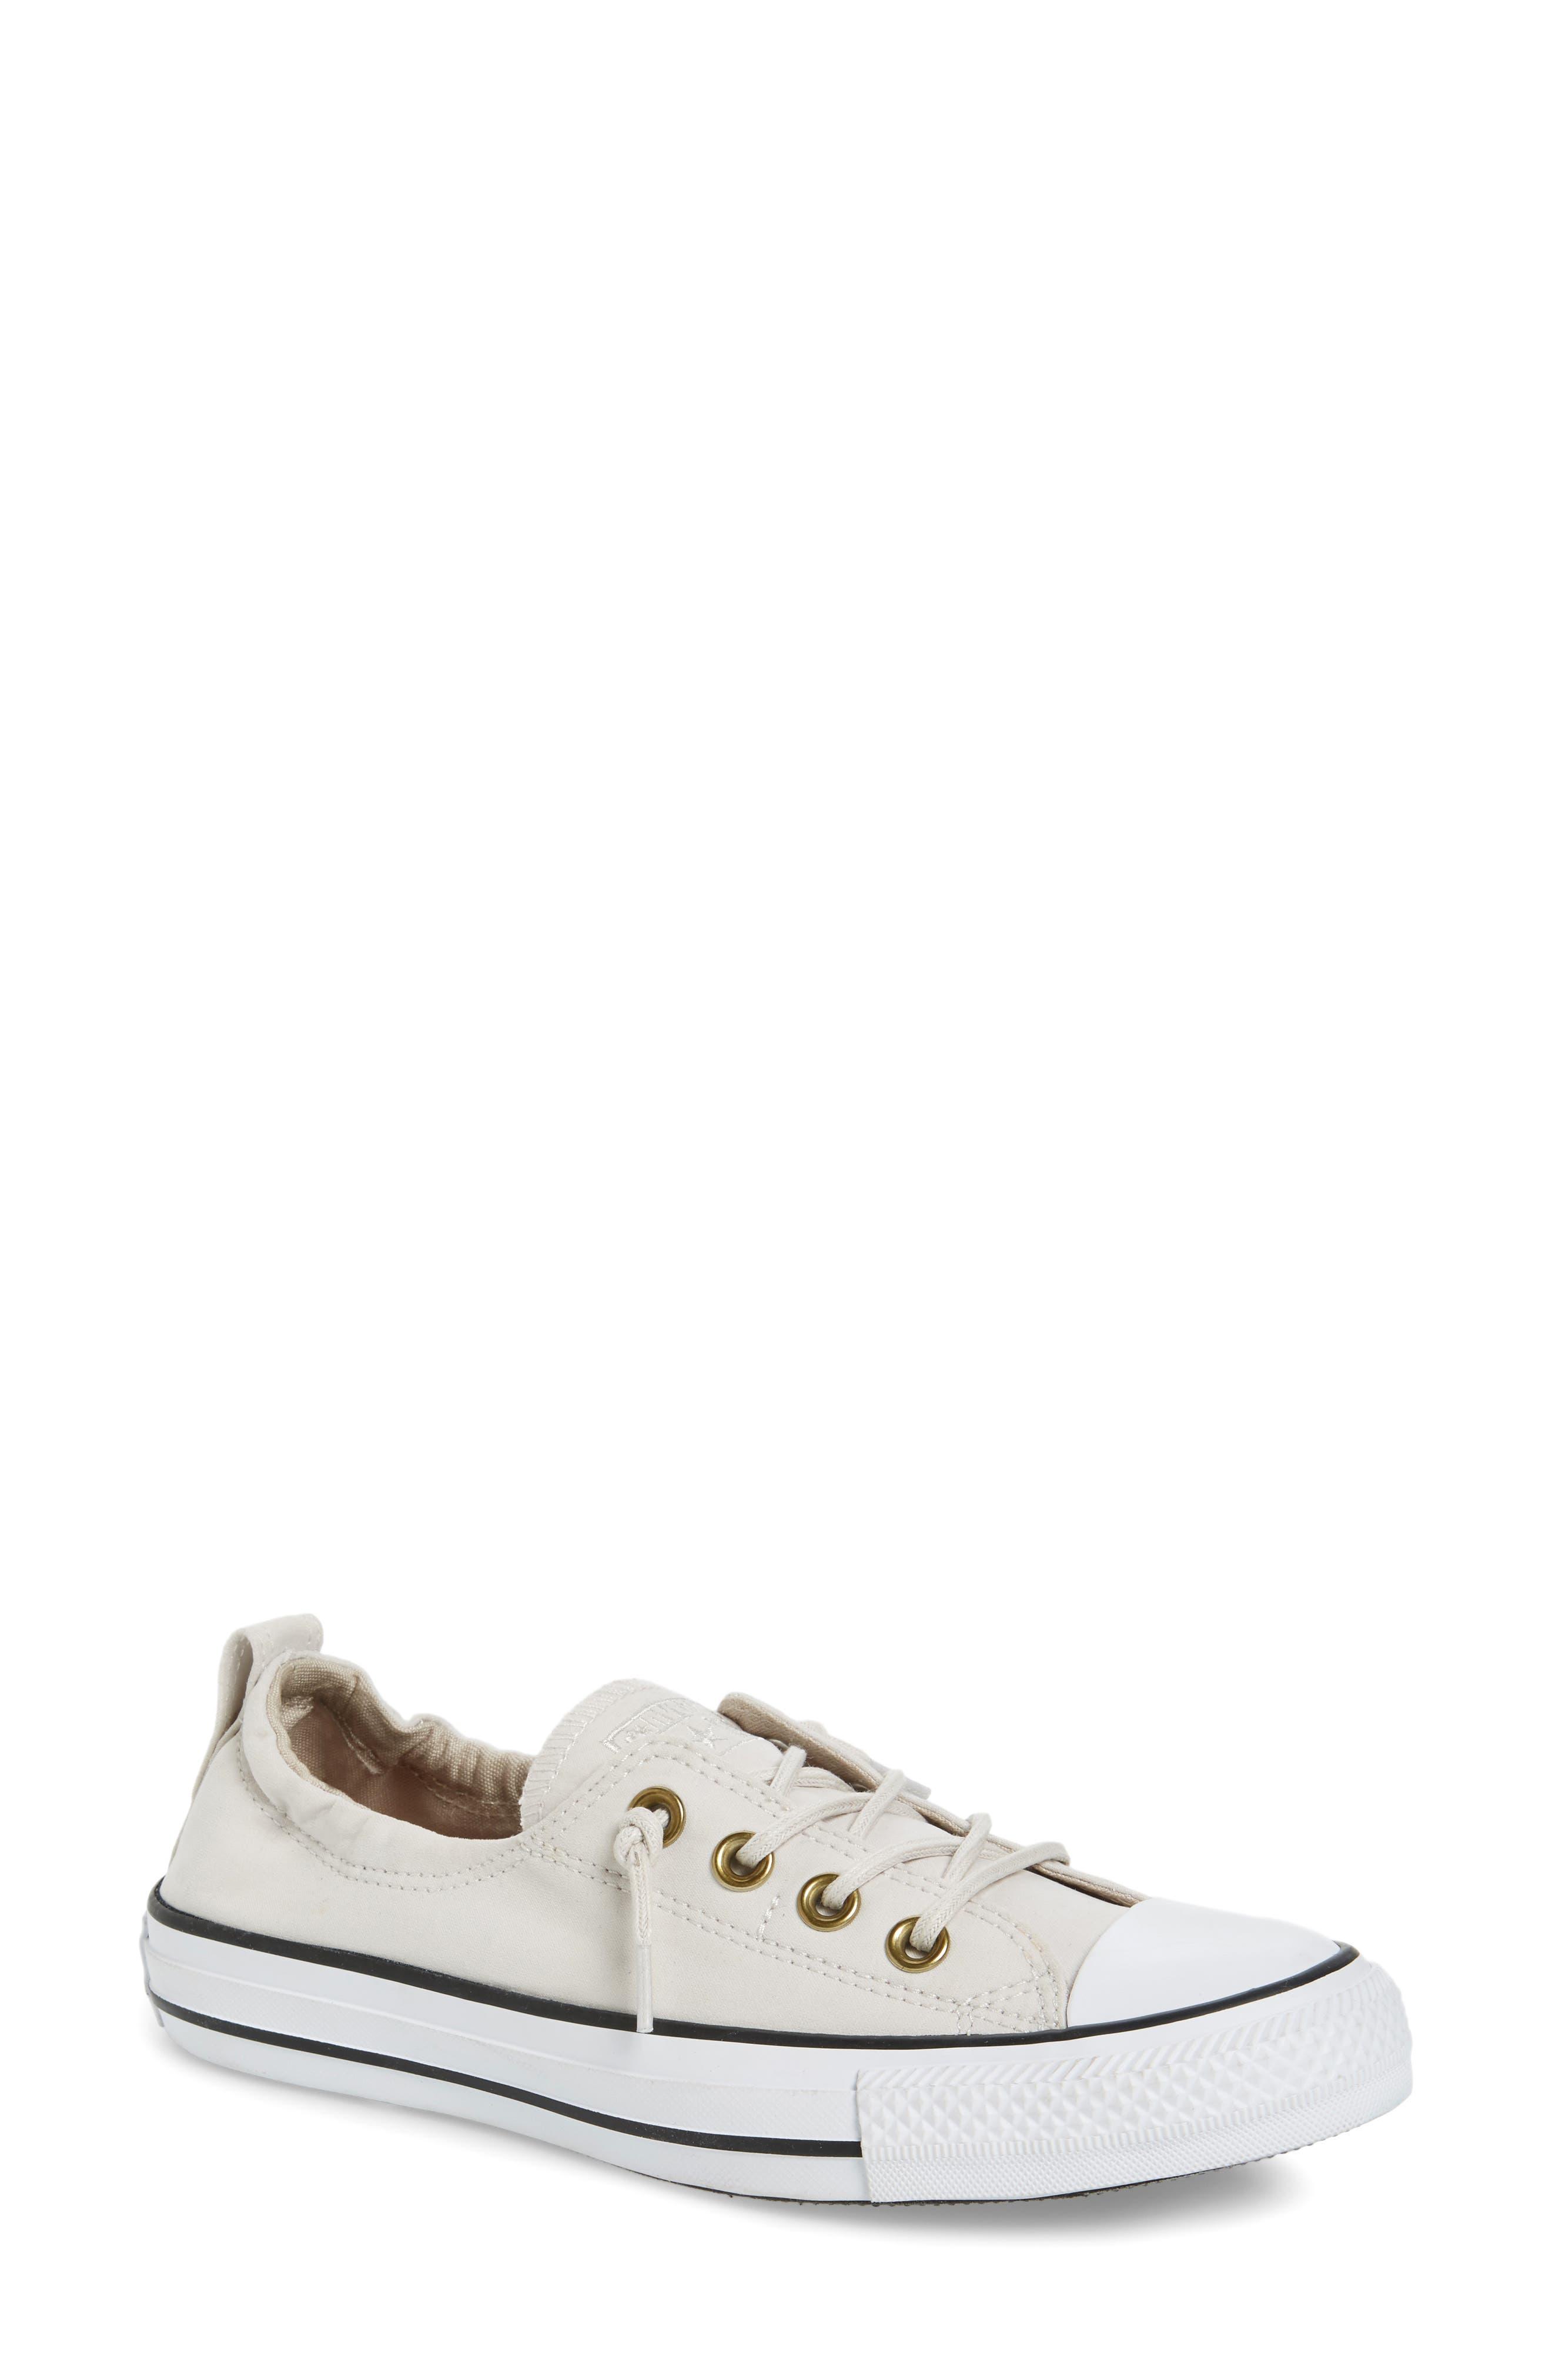 Main Image - Converse Chuck Taylor® All Star® Shoreline Peached Twill Sneaker (Women)